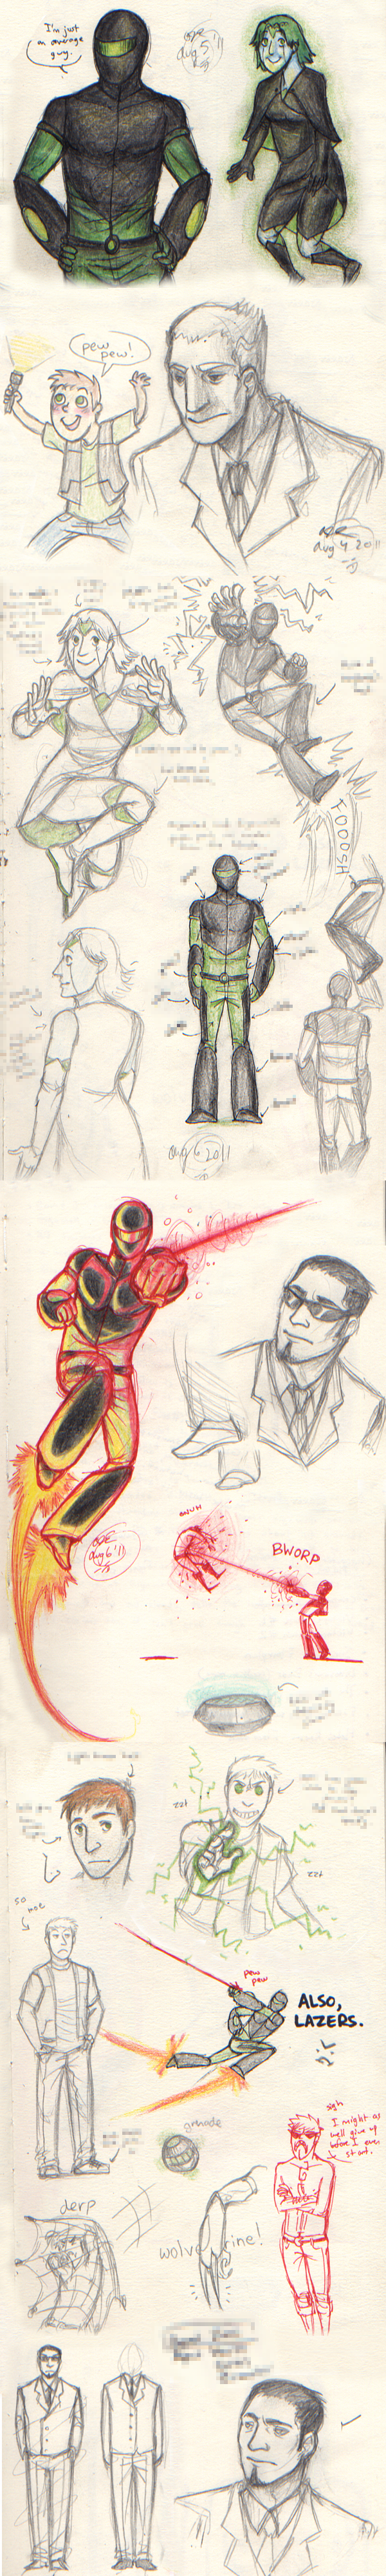 RCR2: Gigawatt Sketches by Jackarais